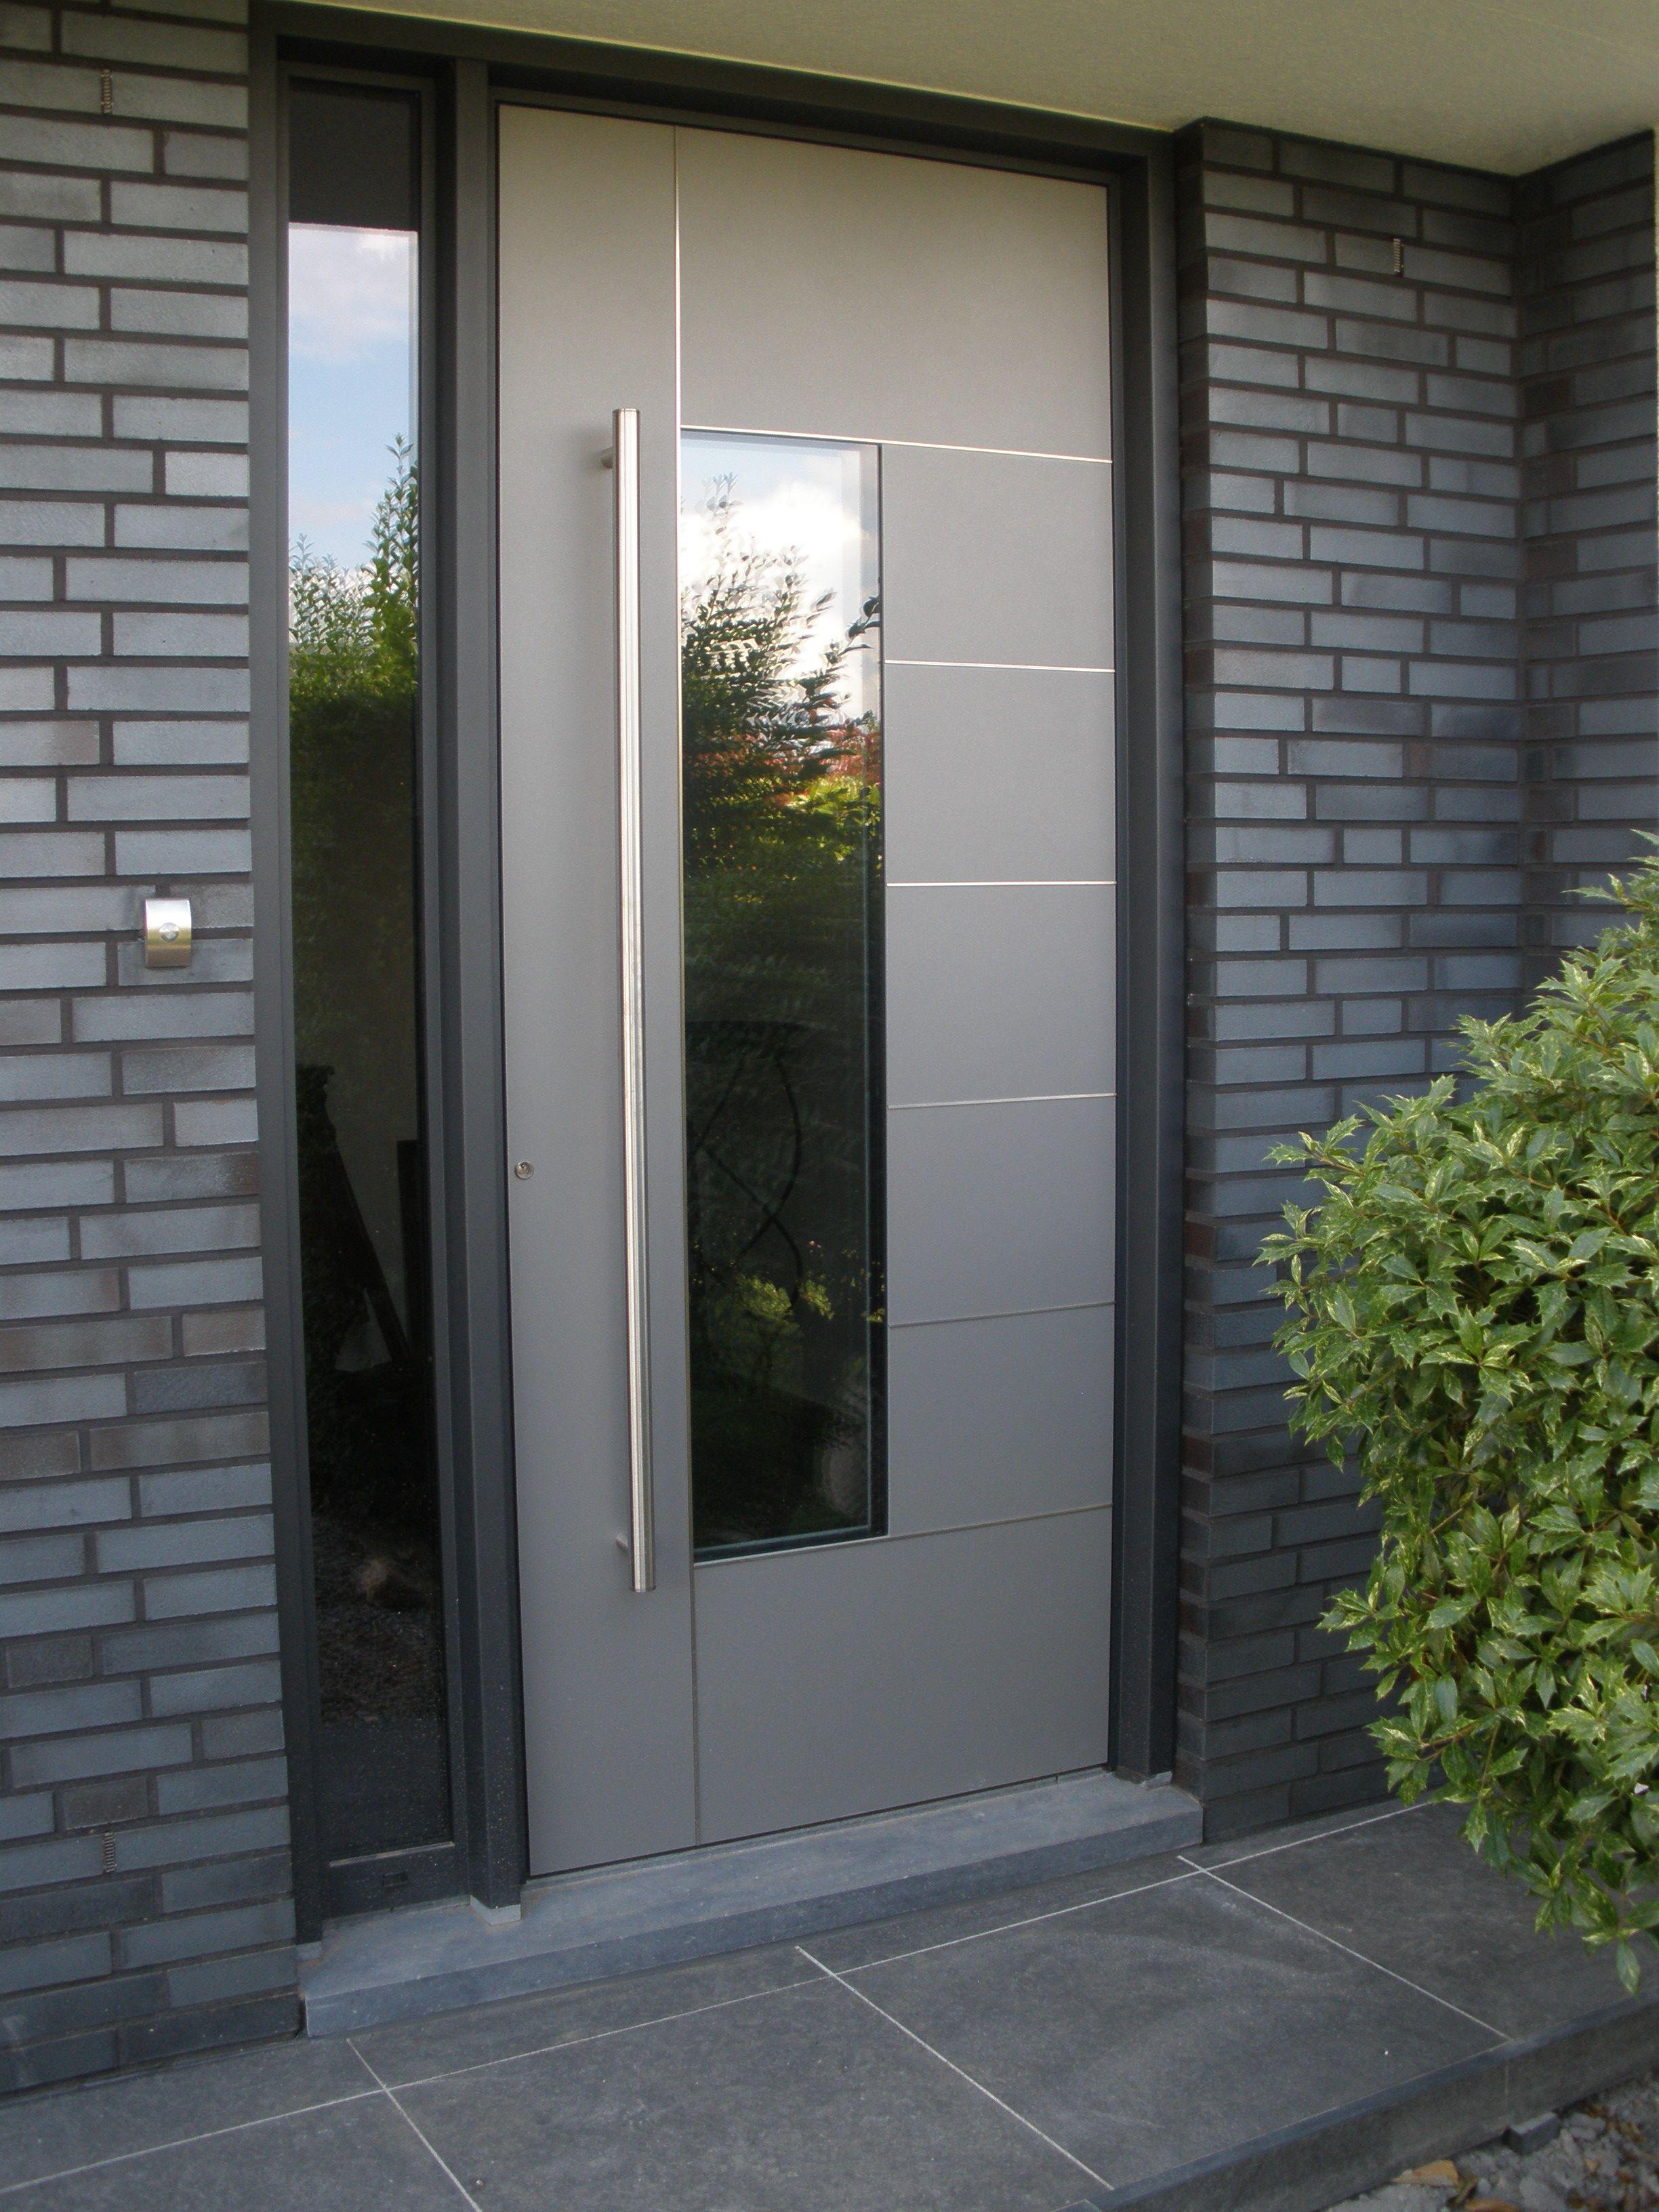 Voordeur kura adeco caverro aluminium vleugeloverdekkend for Modern front doors for homes